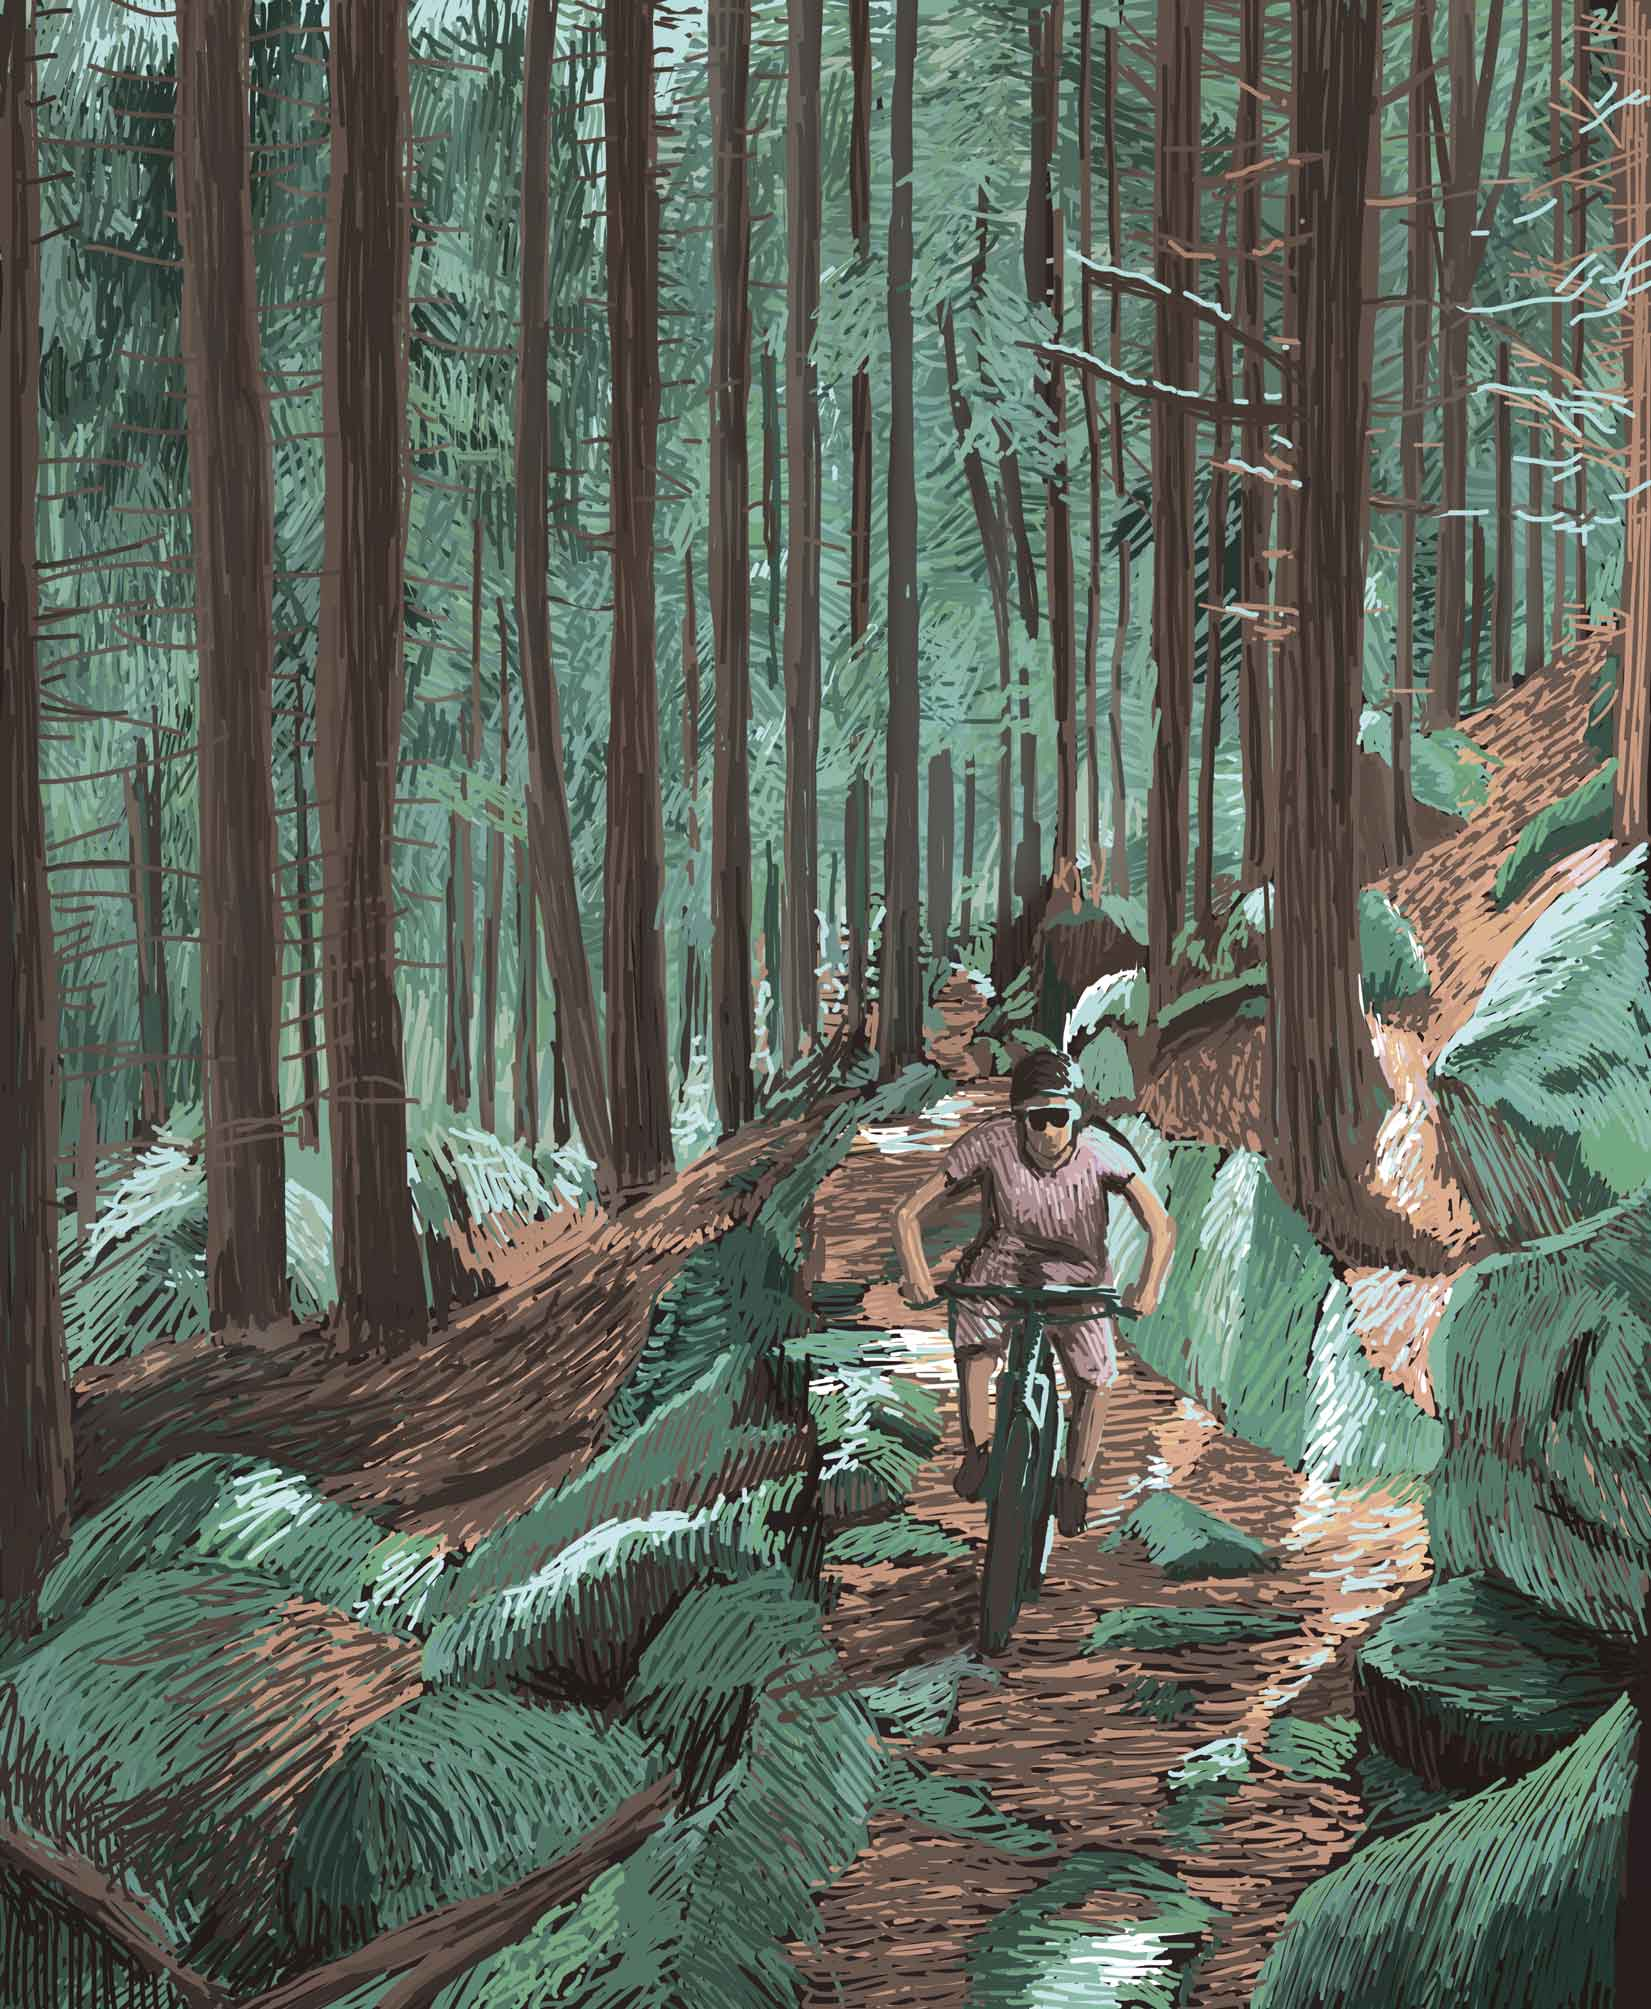 Black Forest – Digital Illustration. A Biker drives through the Black Forest flooded with light. Black Forest – limited Fine Art Print